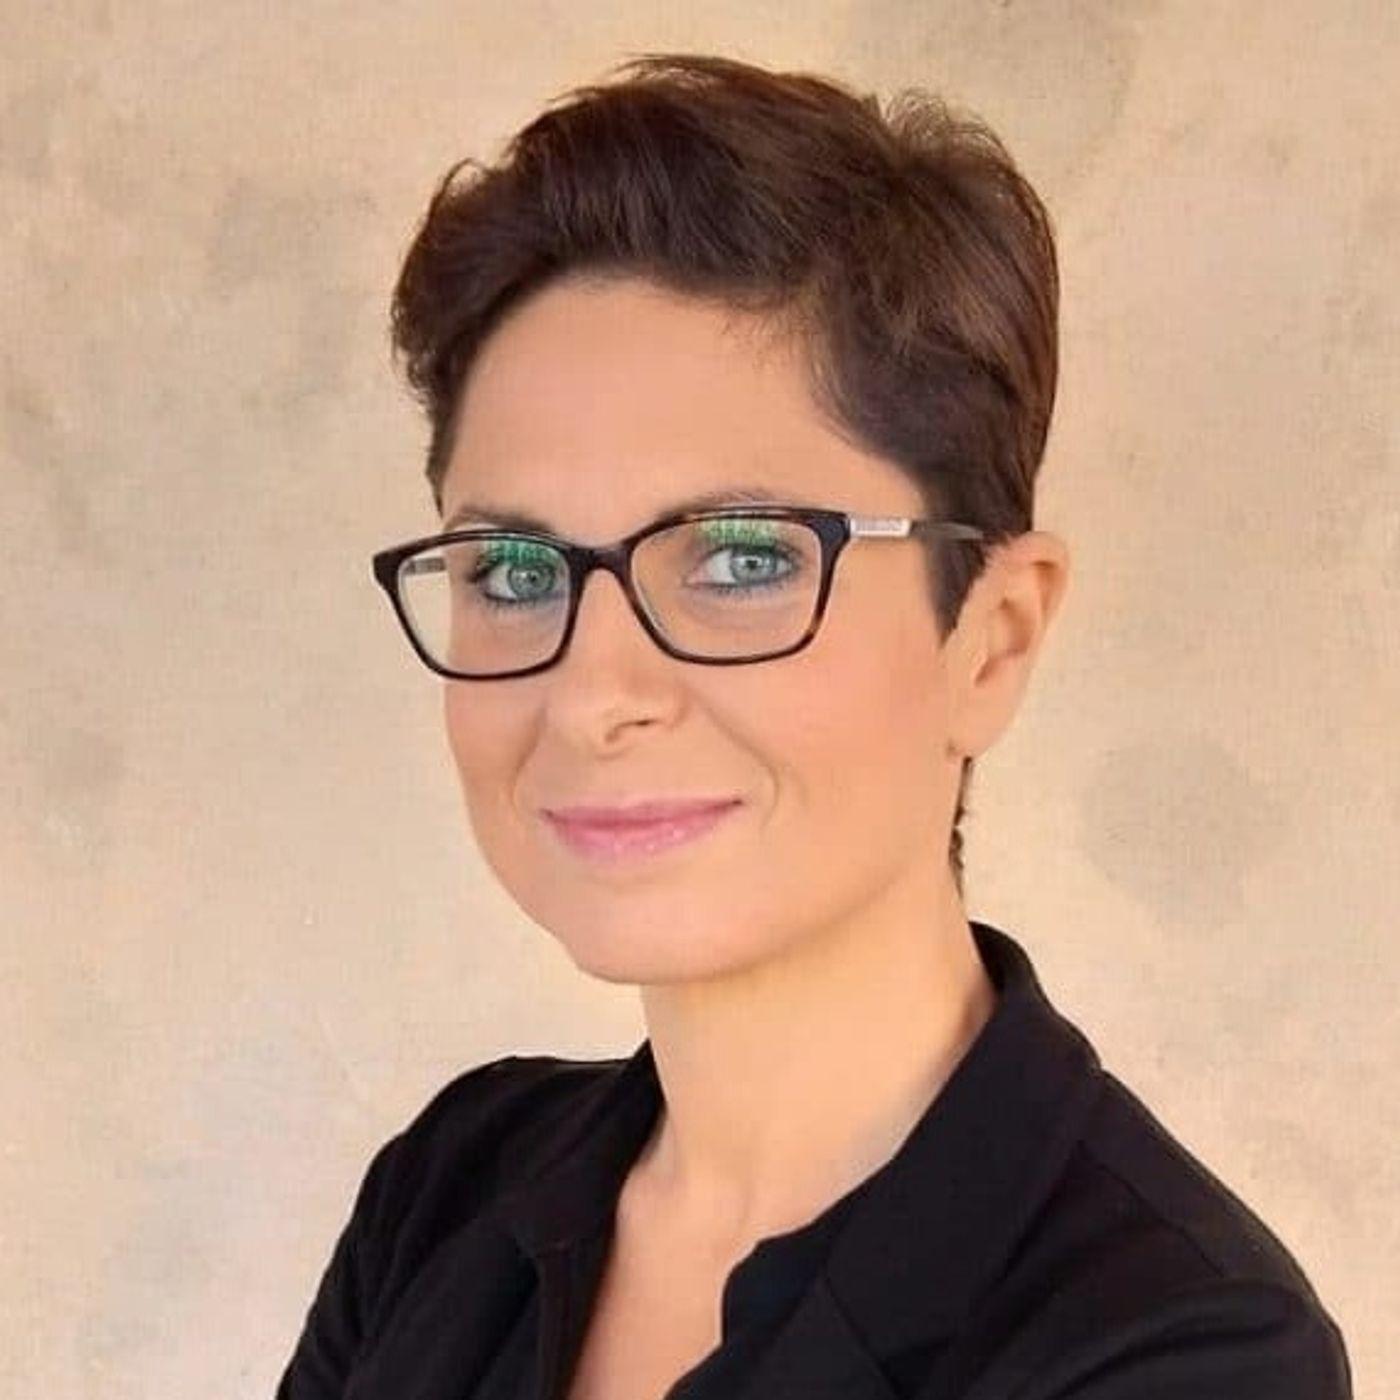 #95 Sharenting su TikTok: intervista a Federica Boniolo di #Unitiinrete